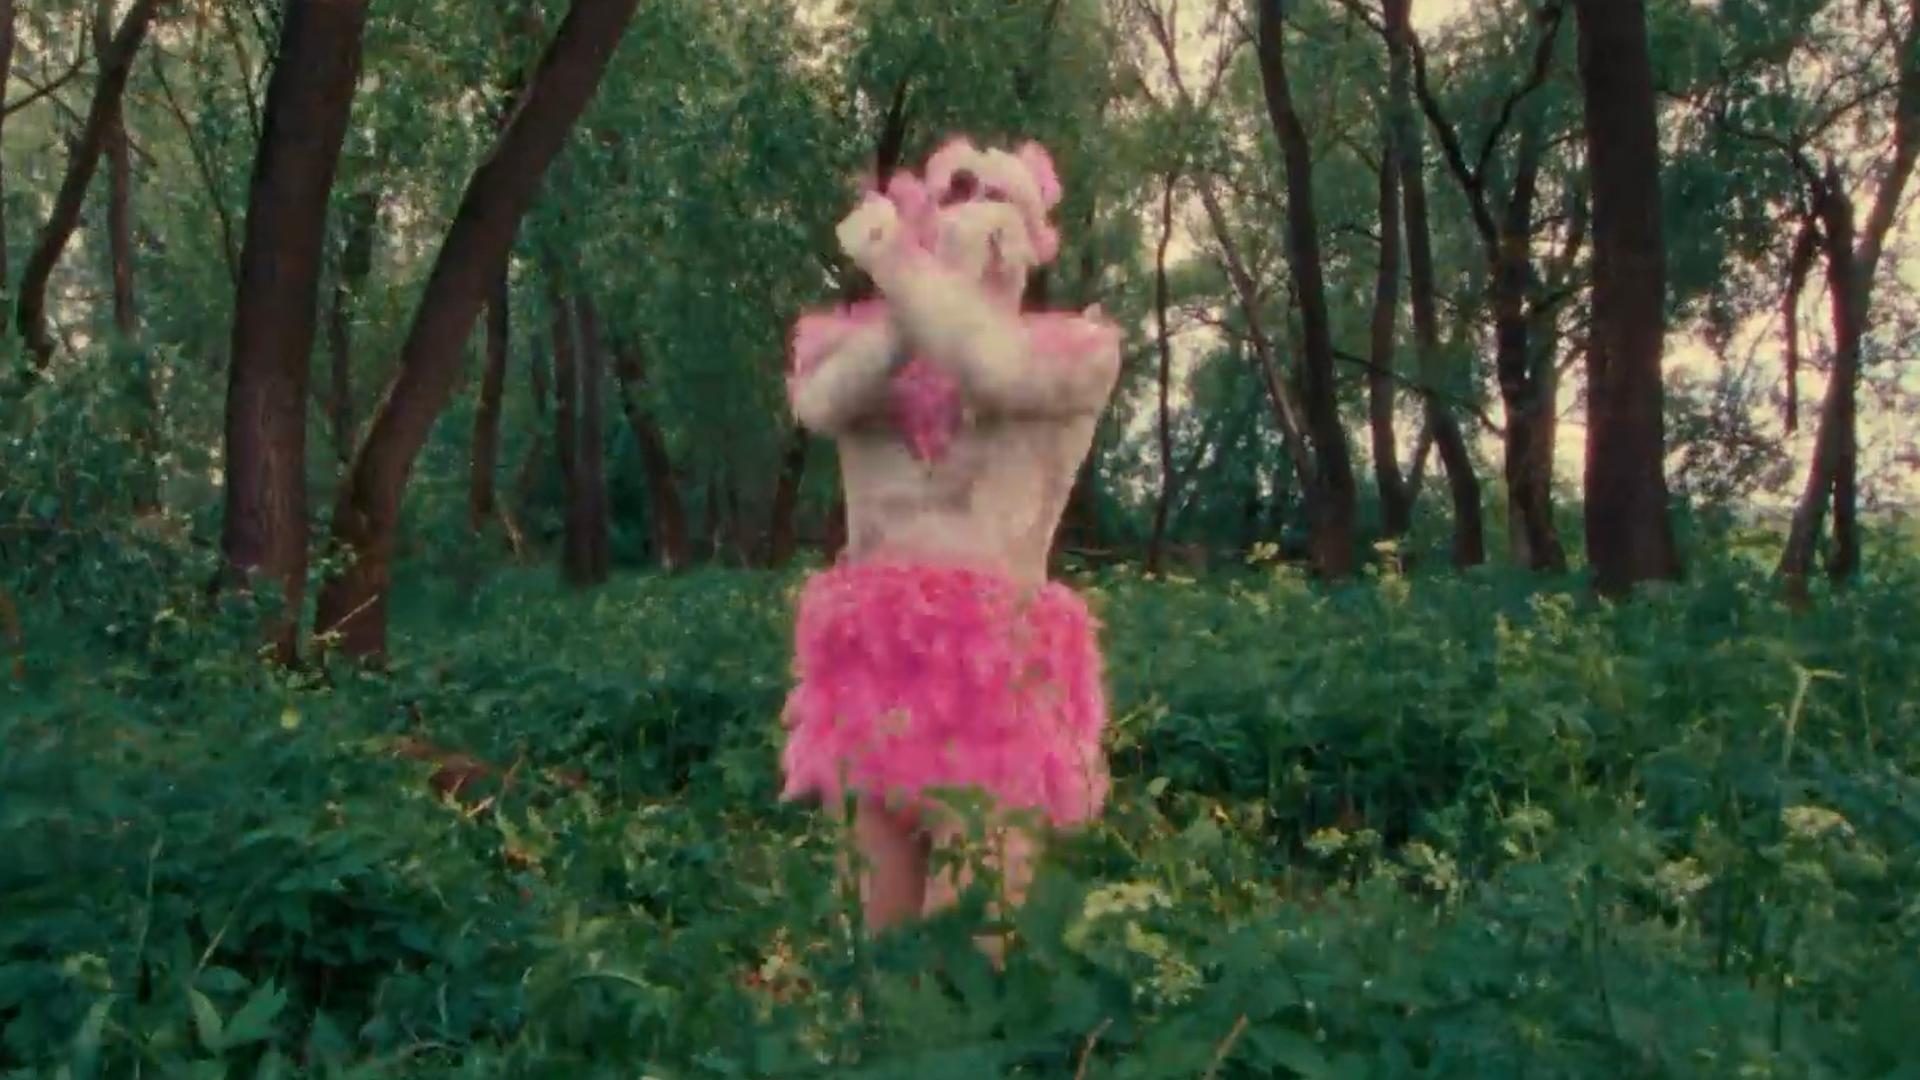 Вышел клип на кавер хита Свиридовой про розового фламинго с участием Гудкова и Понасенкова